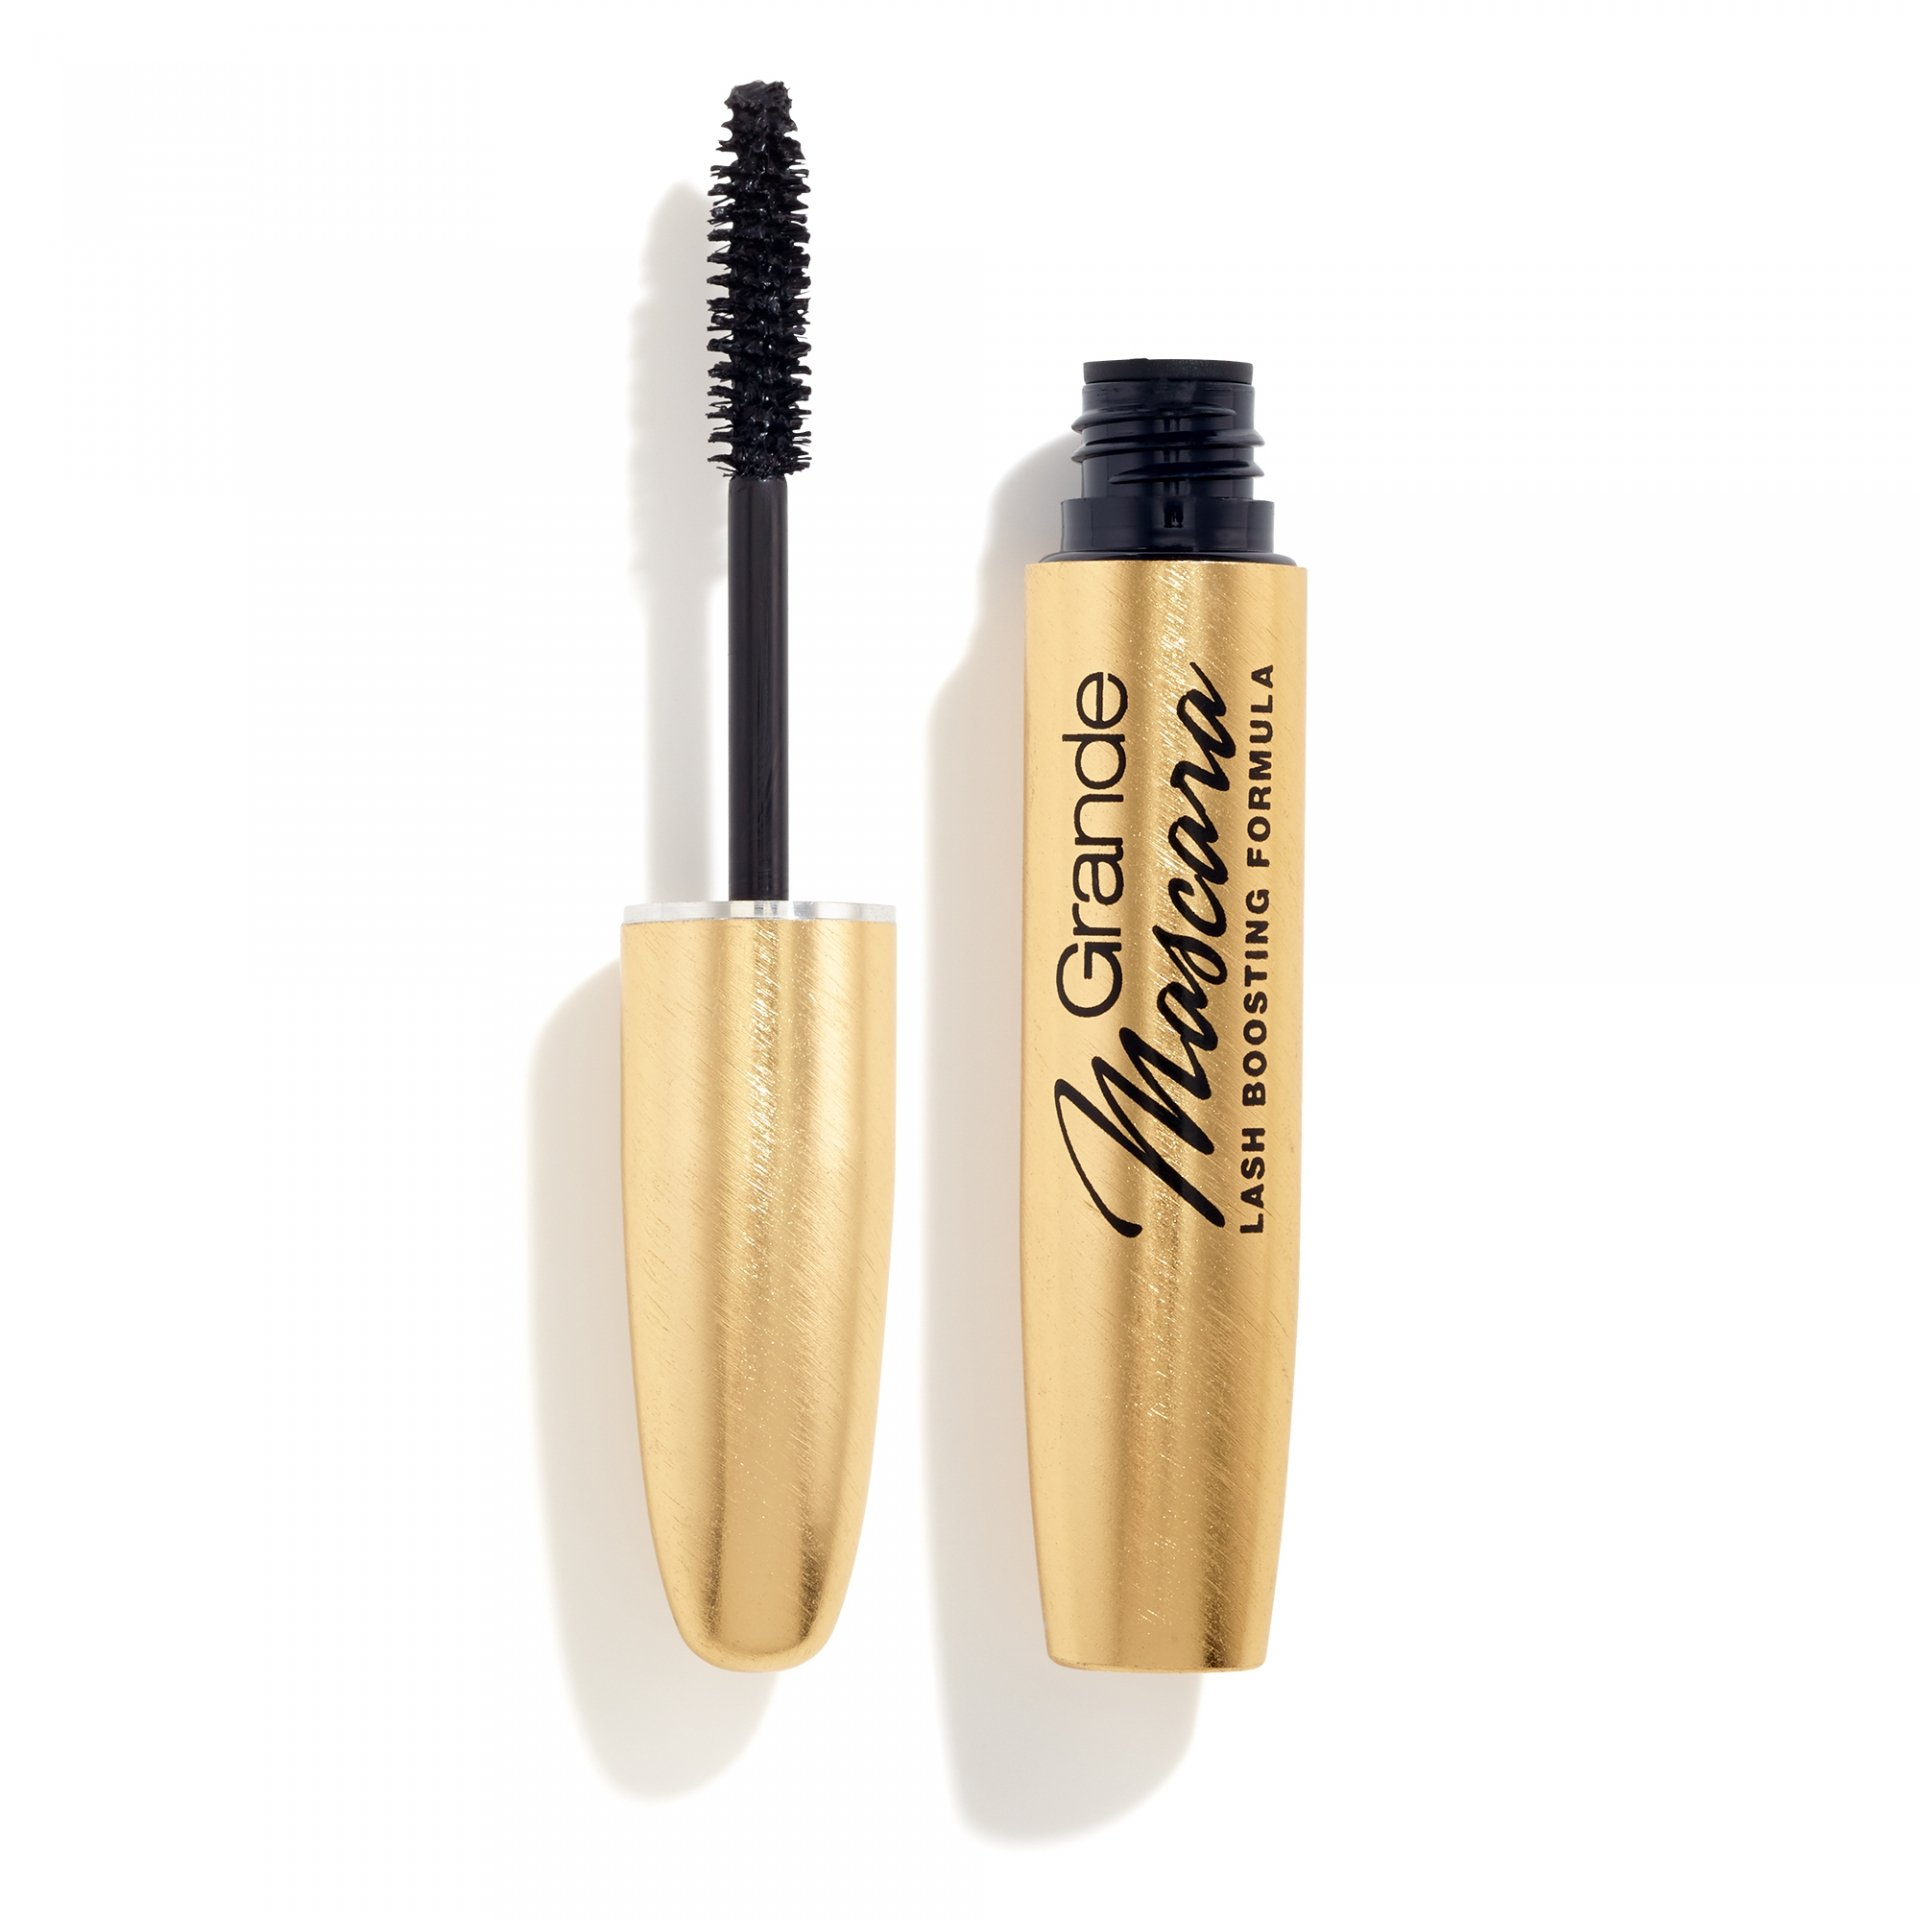 Grande Cosmetics - GrandeMascara - zwart Mascara